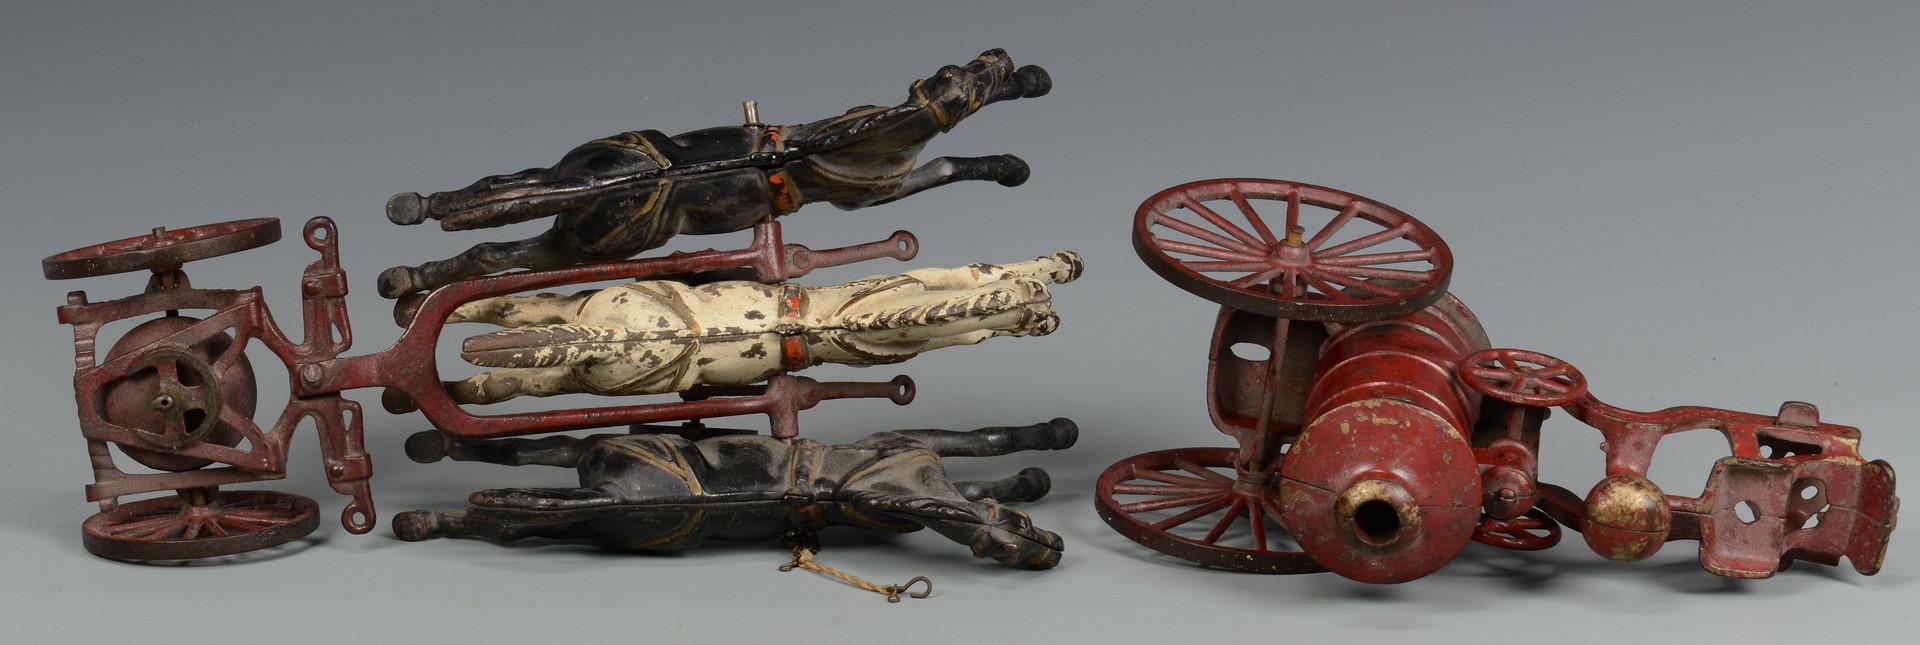 Lot 454: 2 Cast Iron Fire Toys: Wagon & Pumper